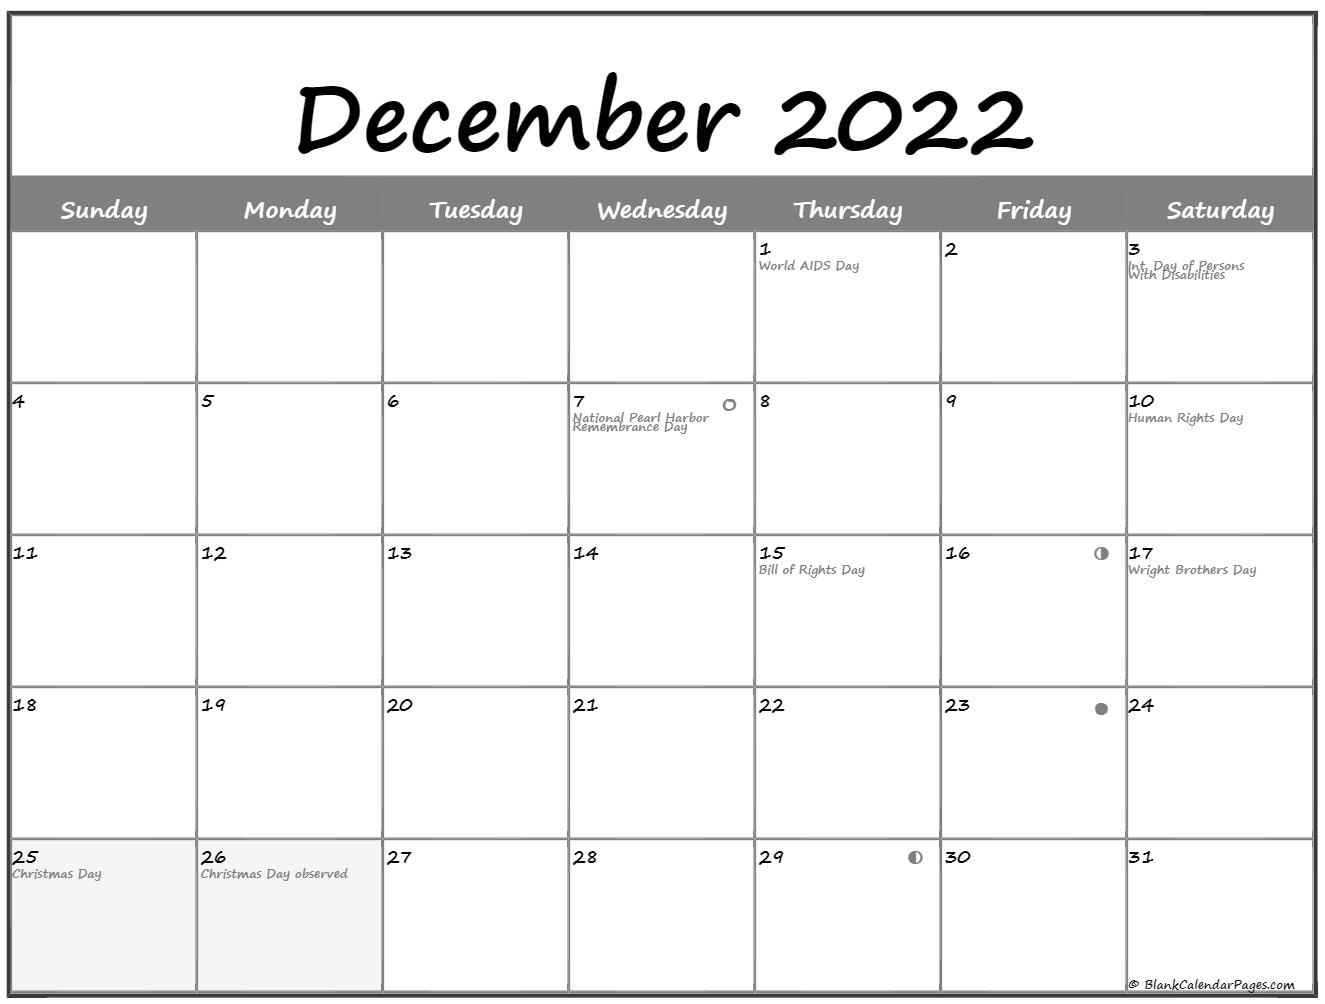 December 2019 Lunar calendar. moon phase calendar with USA holidays